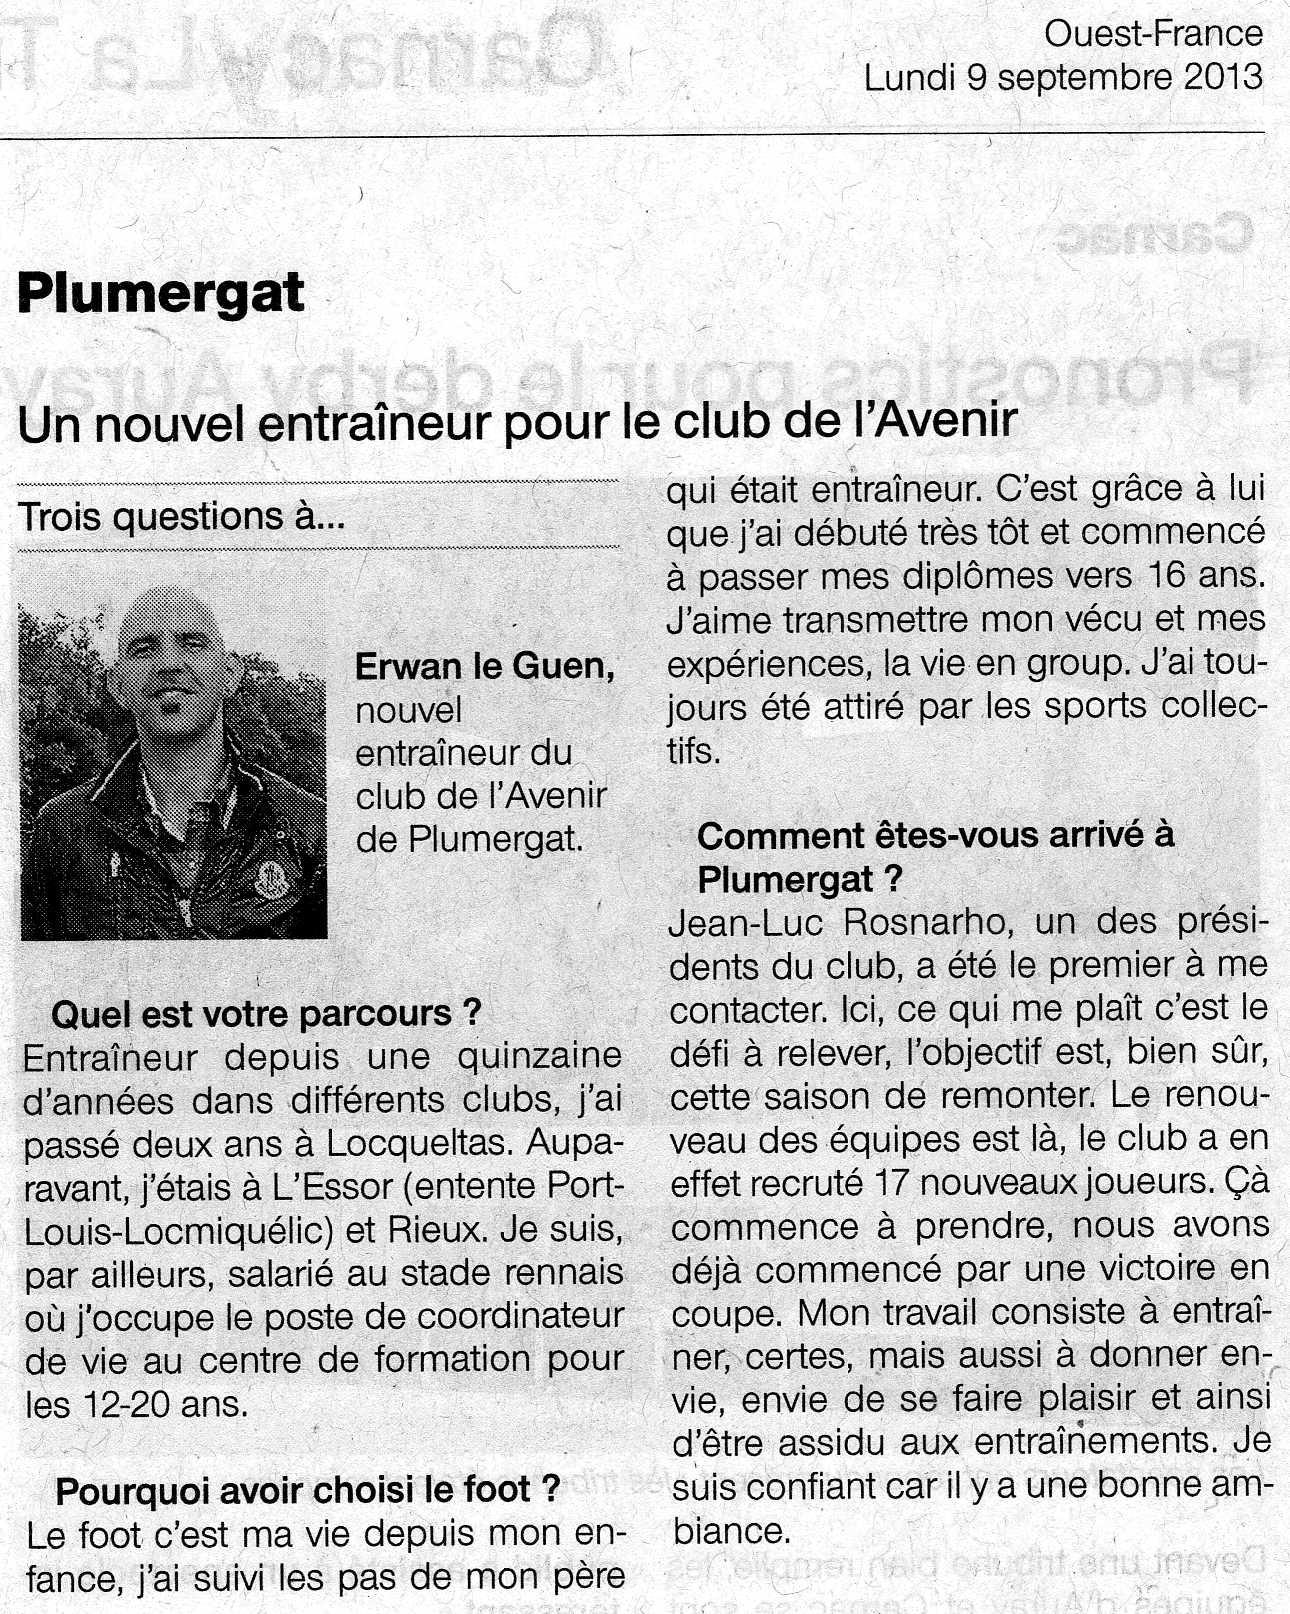 Ouest France Lundi 9 septembre 2013